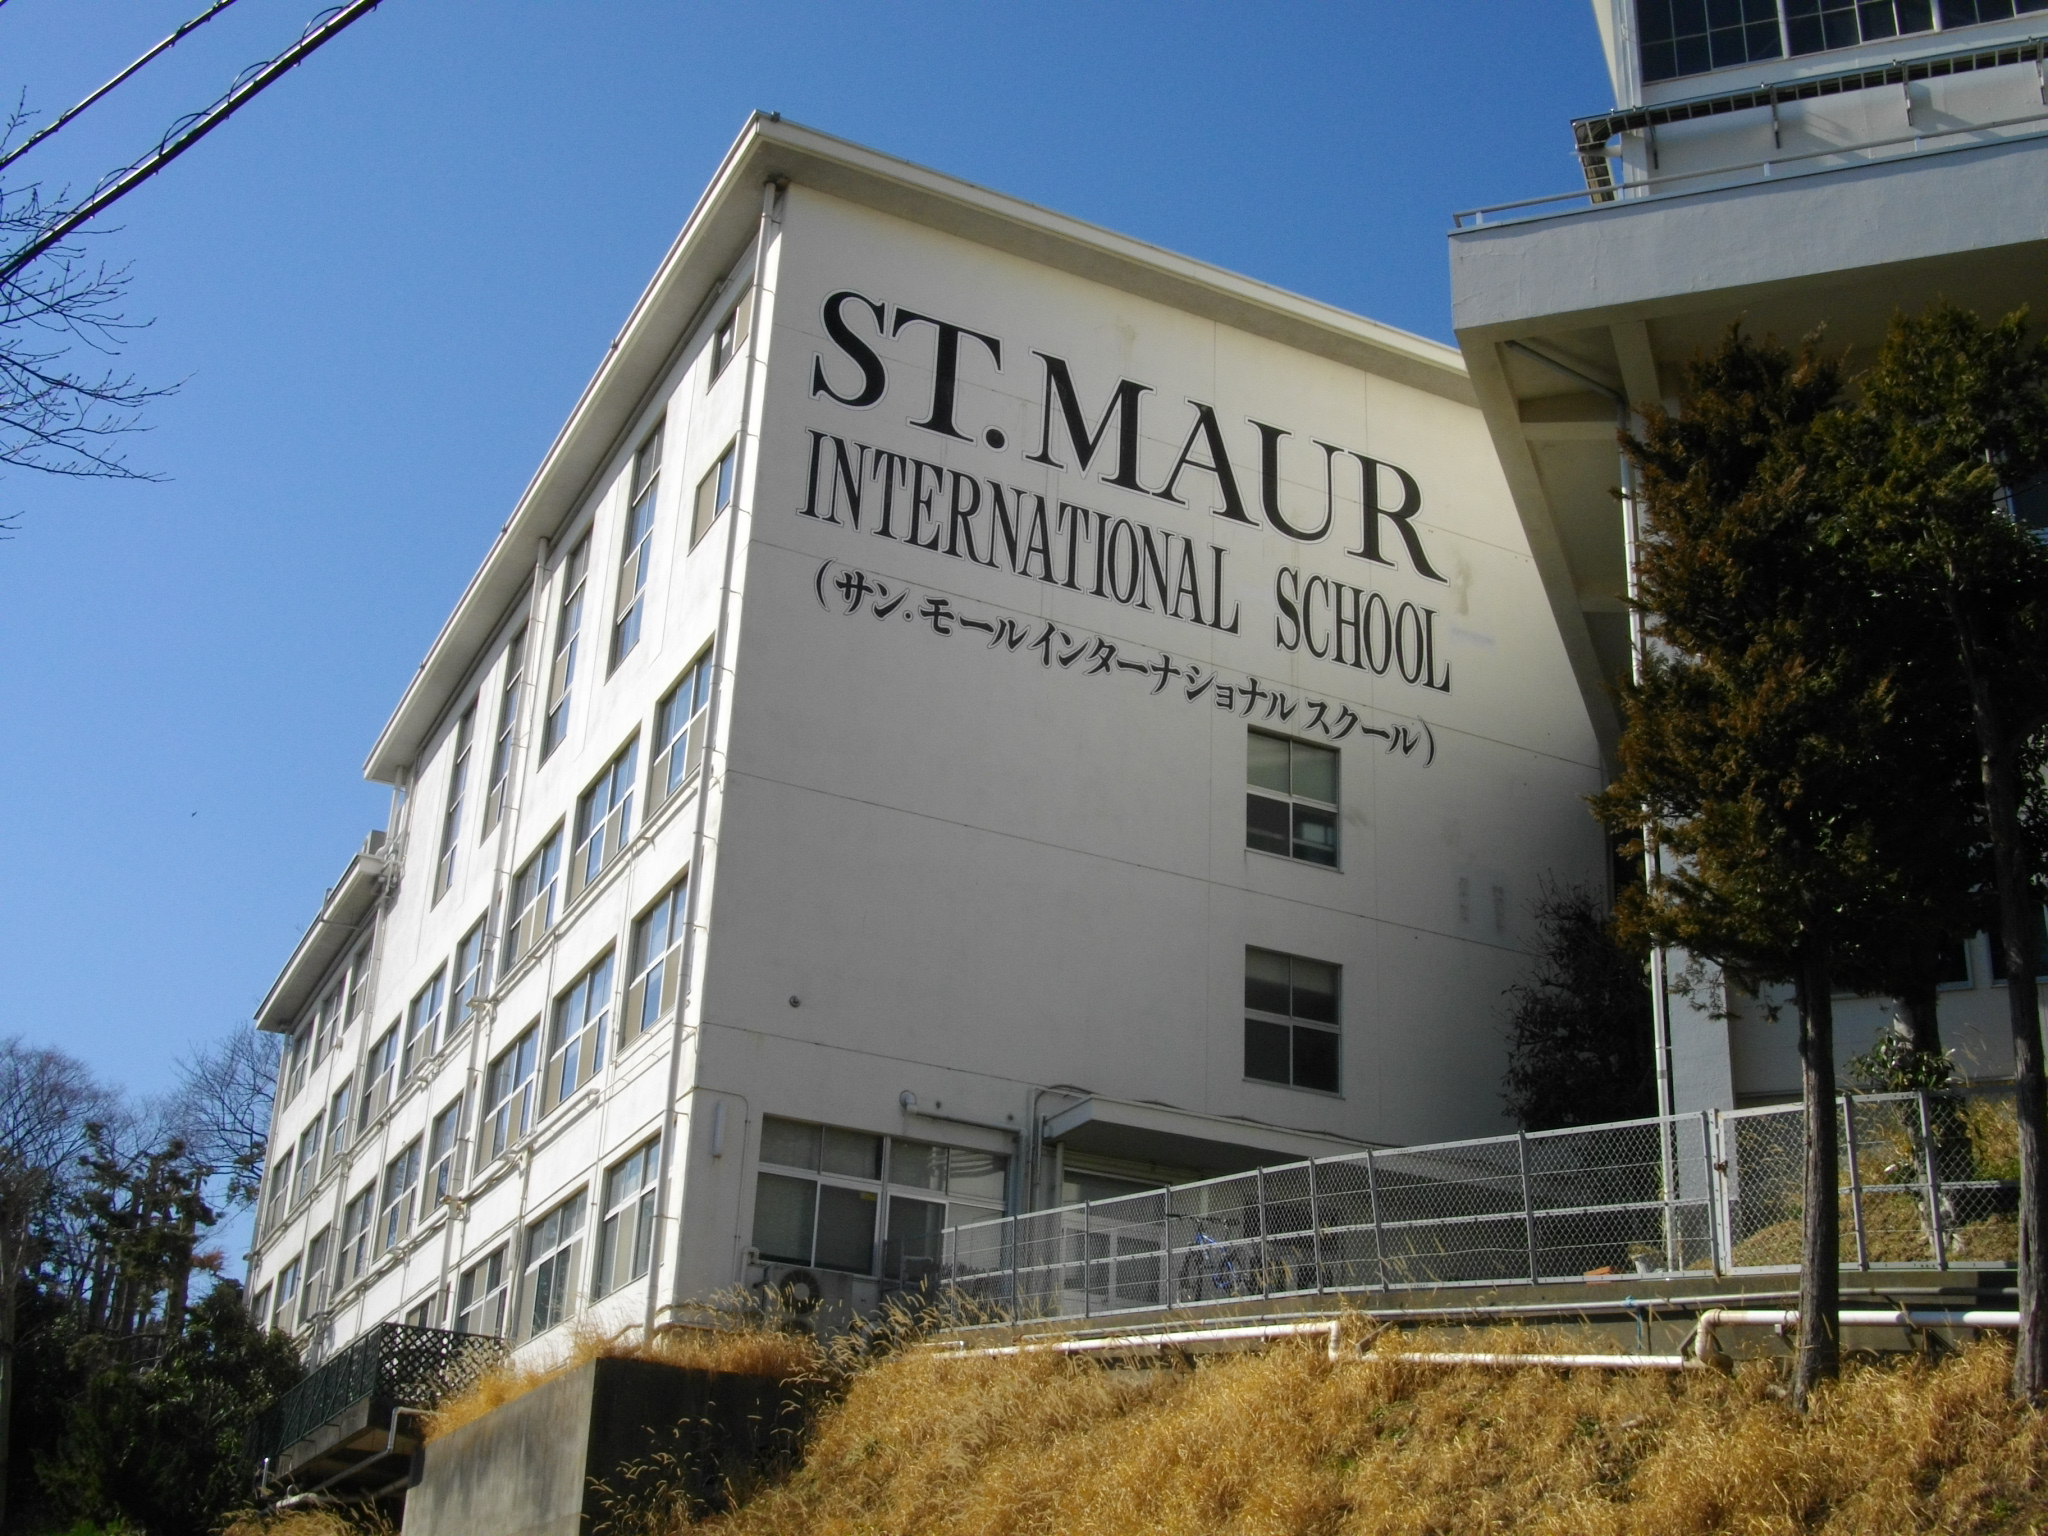 saint maur international school. Black Bedroom Furniture Sets. Home Design Ideas